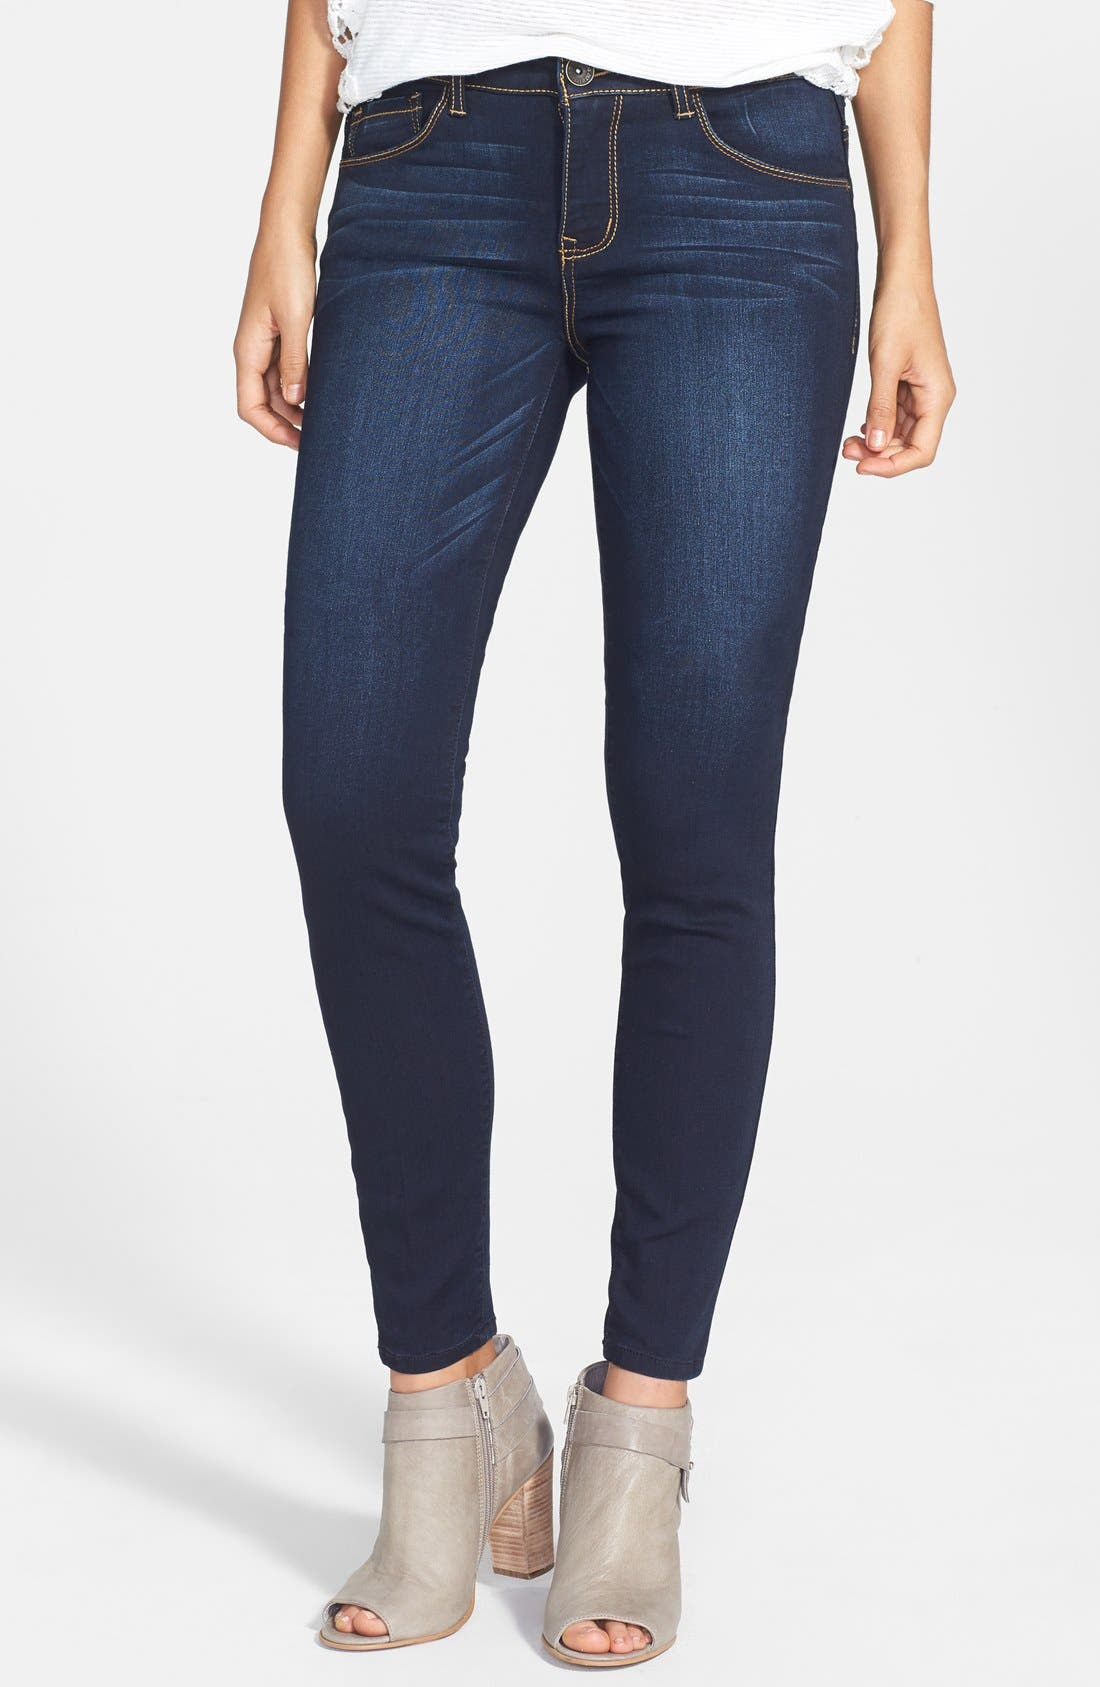 Main Image - Jolt Stretch Skinny Jeans (Online Only)